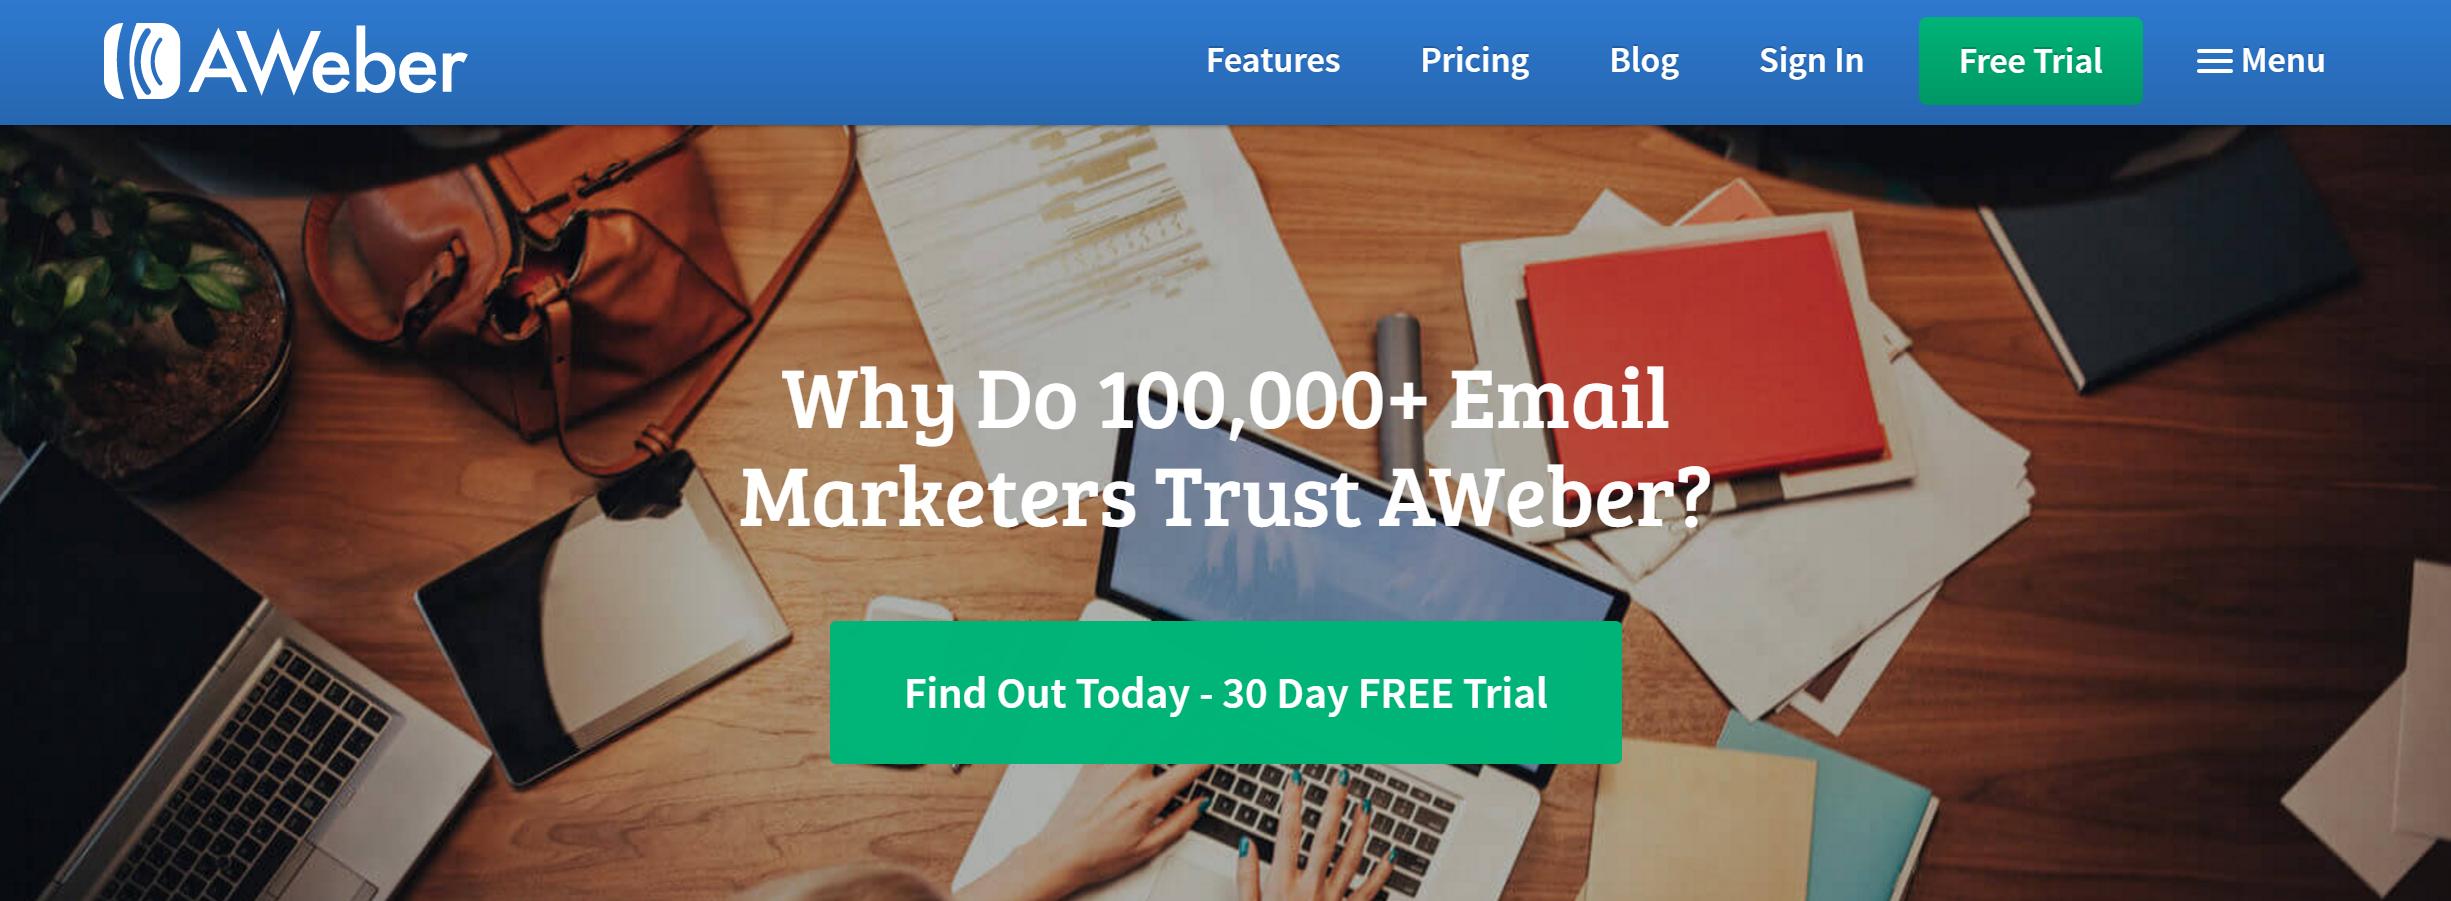 Online marketing tools for nonprofits, AWeber email marketing screenshot